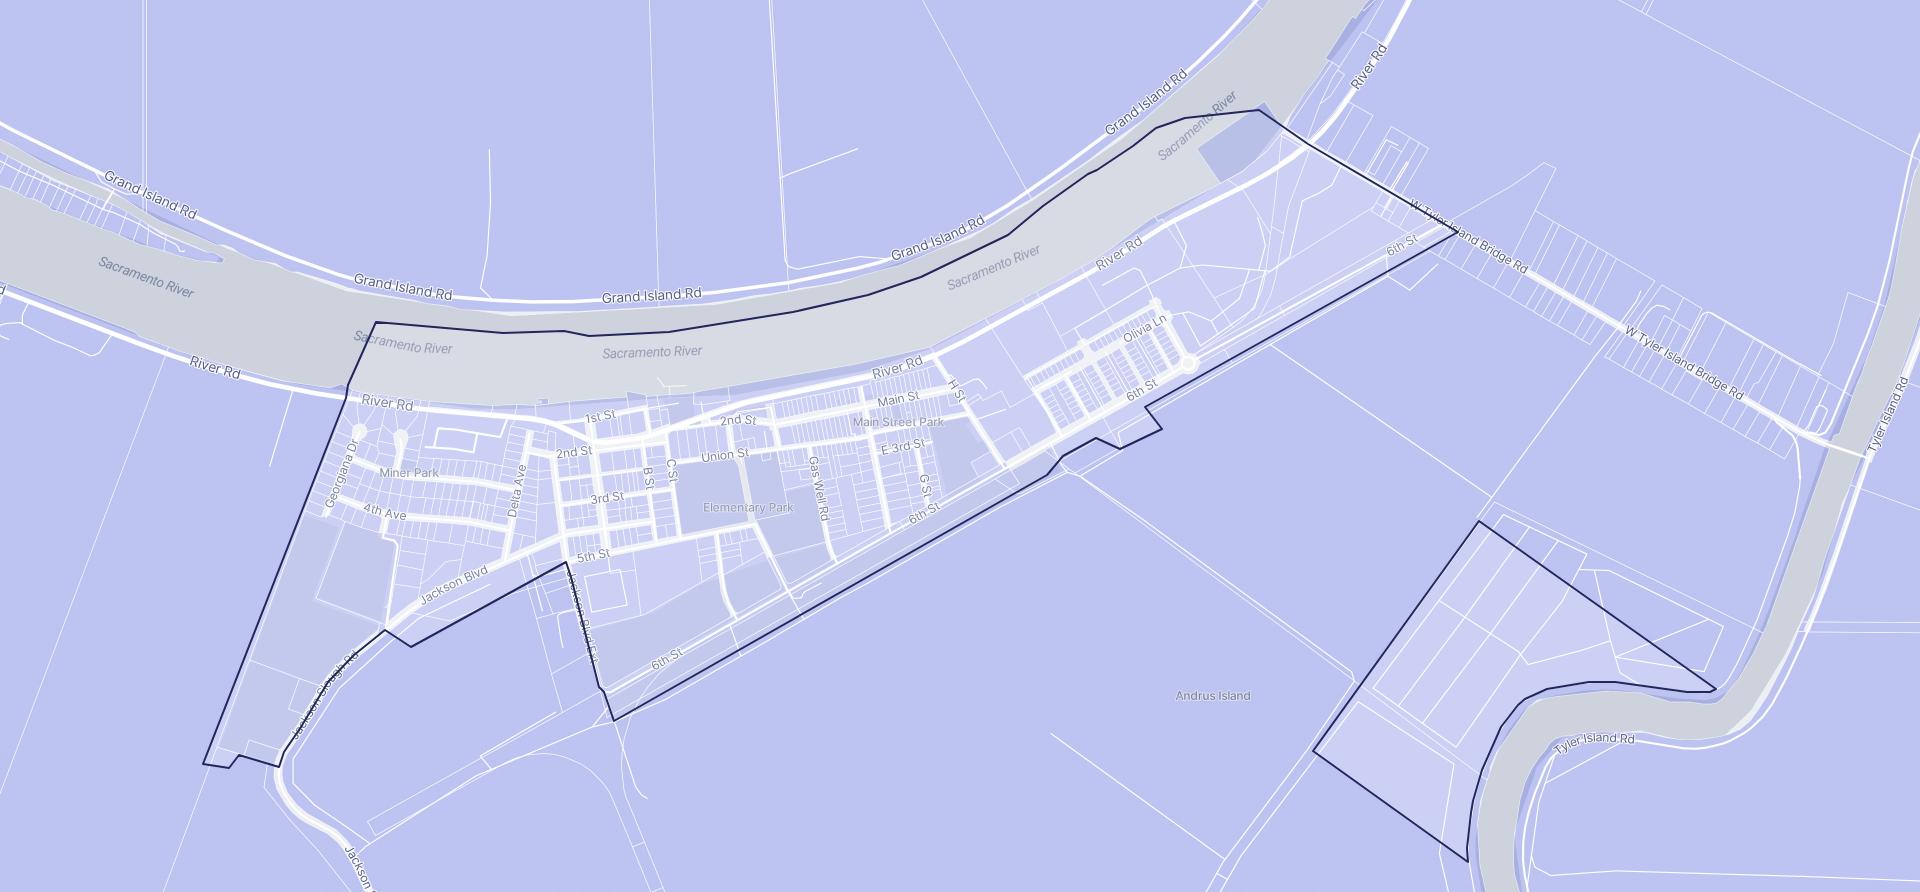 Image of Isleton boundaries on a map.